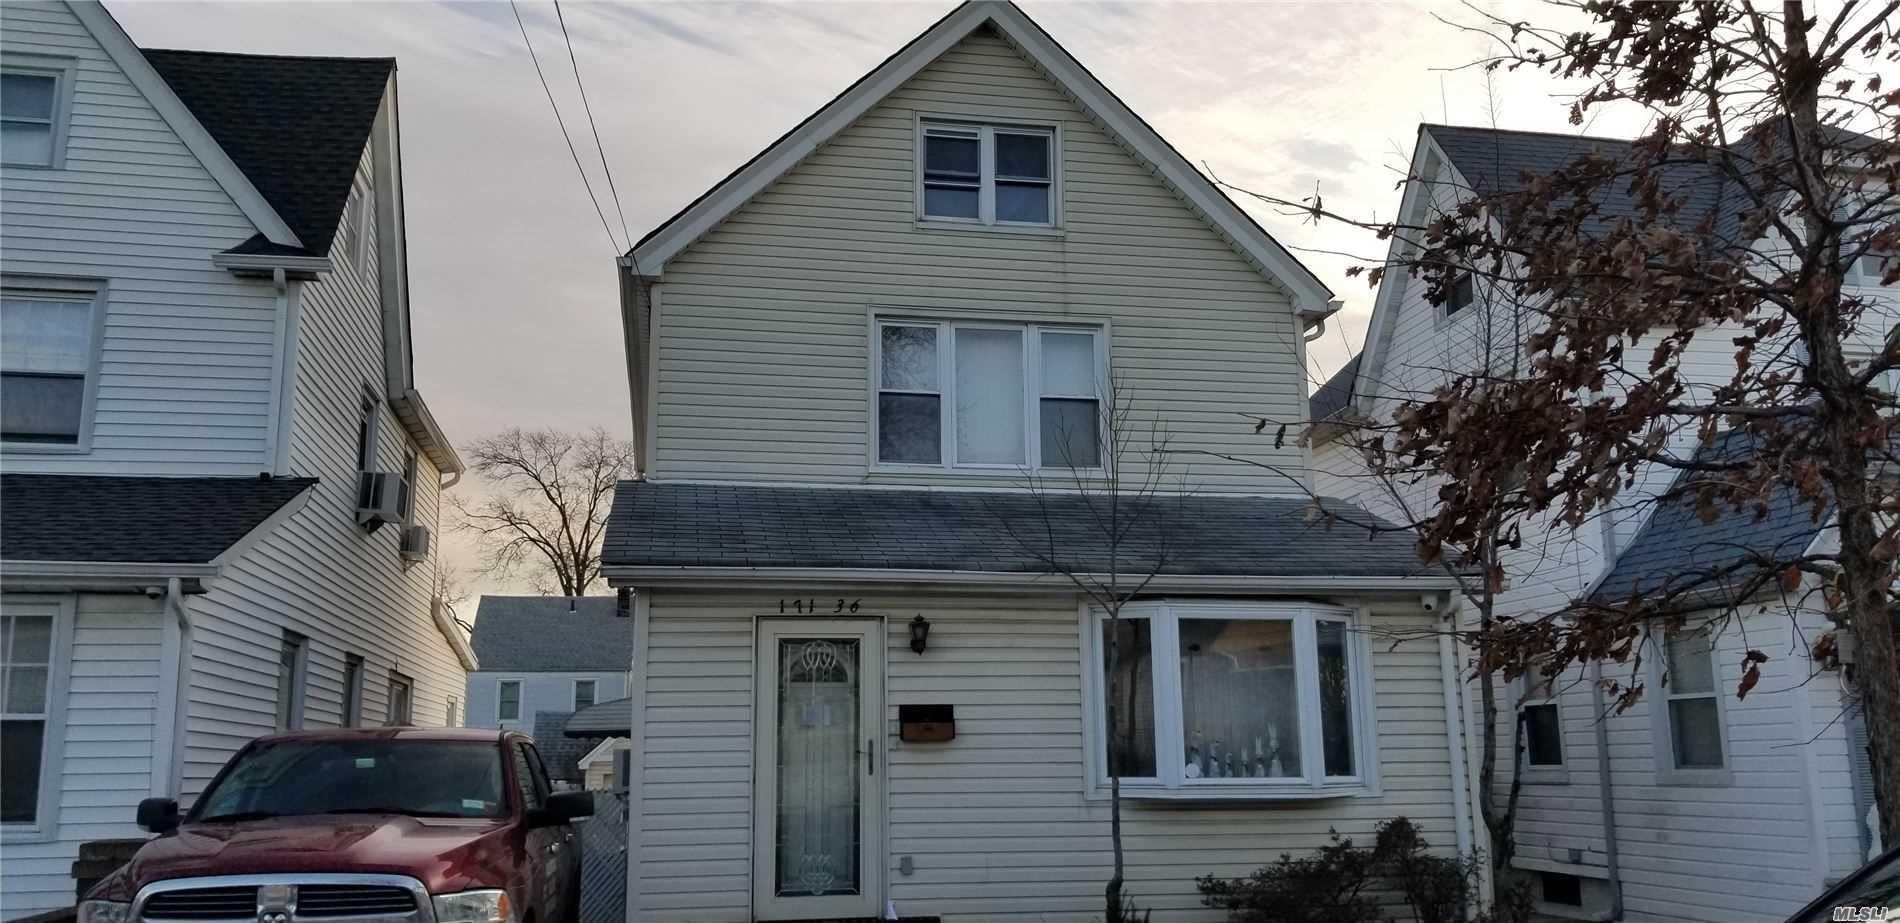 171-36 Bagley Avenue, Flushing, NY 11358 - MLS#: 3195294